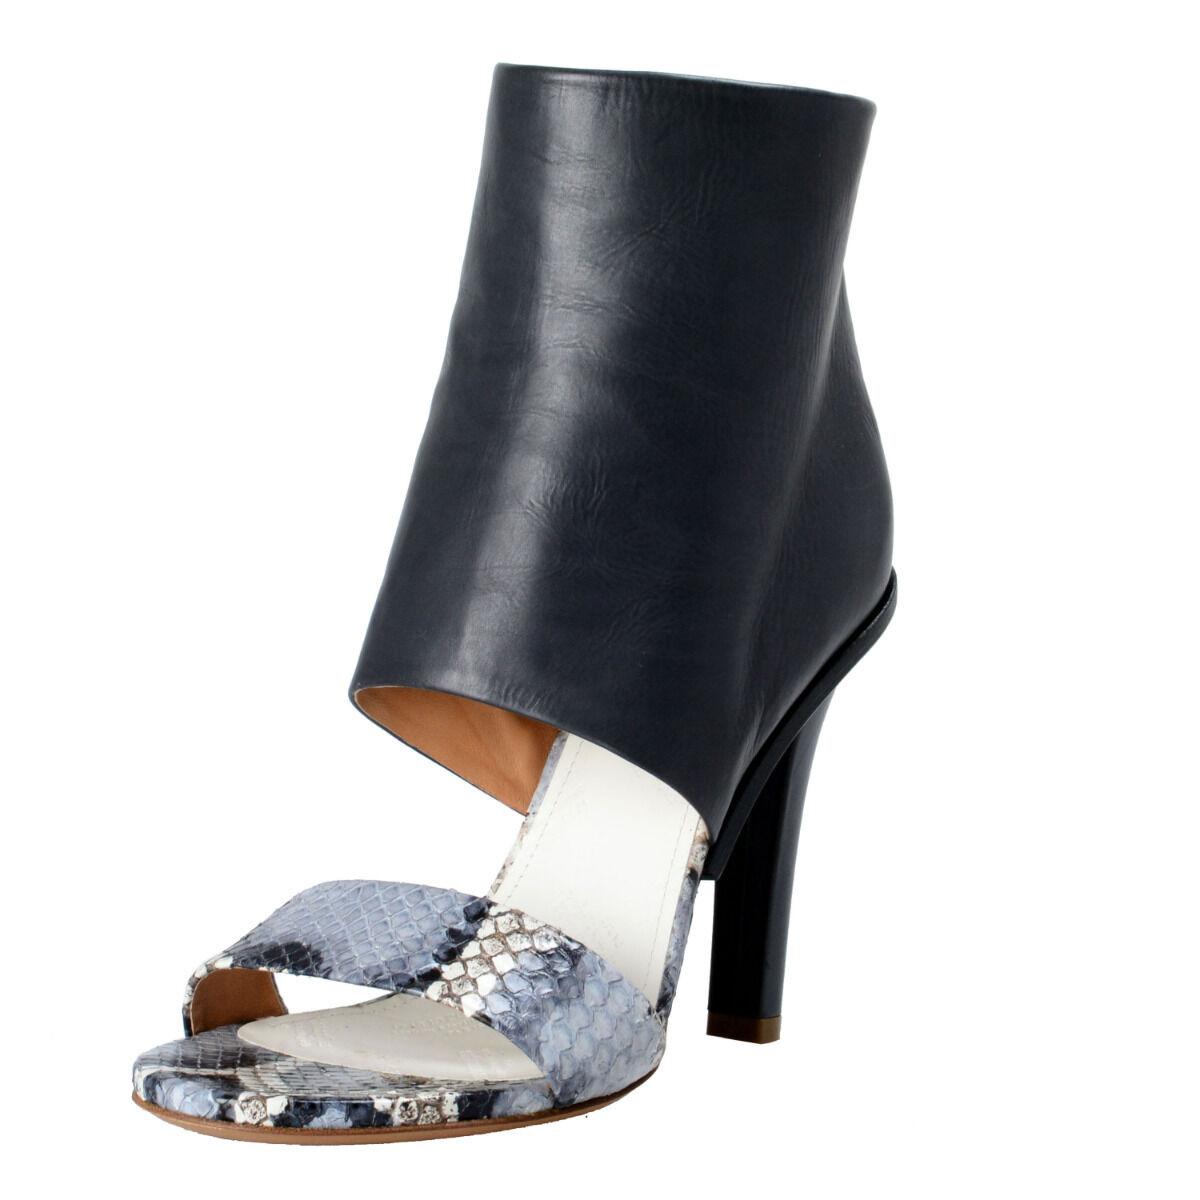 Maison Margiela 22 Damen Python Leder High Heels Sandaletten Schuhe Sz 6 9 10      Schönes Design